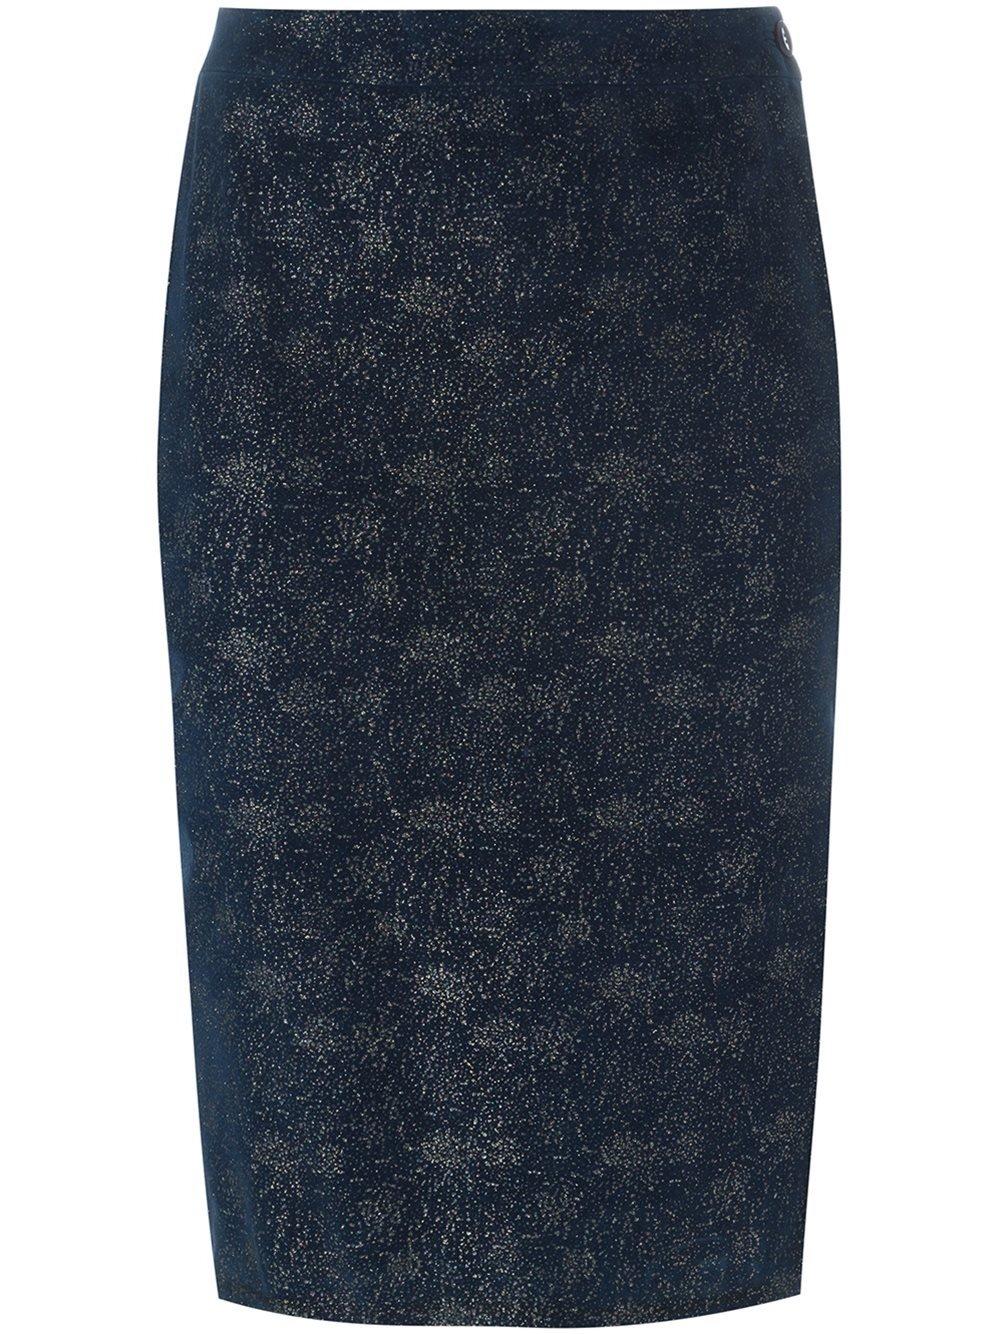 romeo gigli glitter pencil skirt in blue lyst